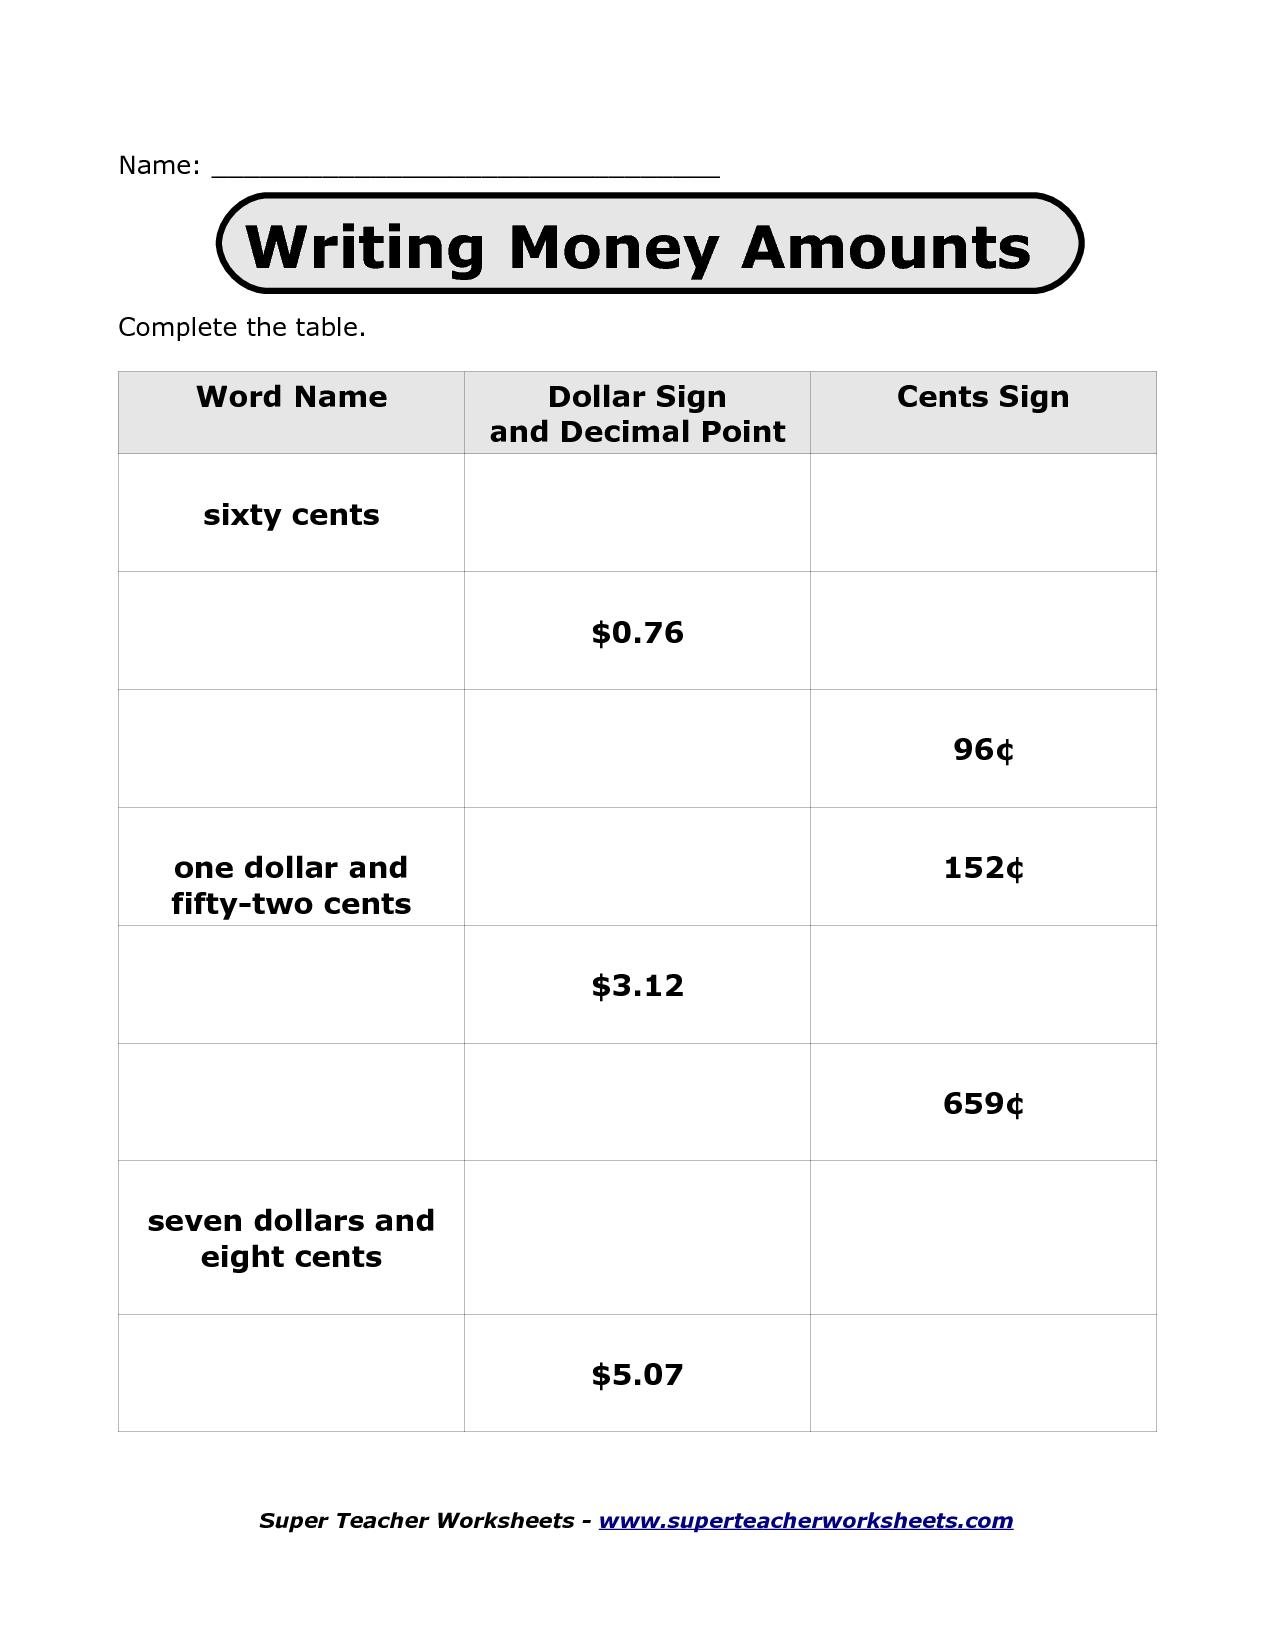 13 Best Images Of Super Teacher Worksheet Money